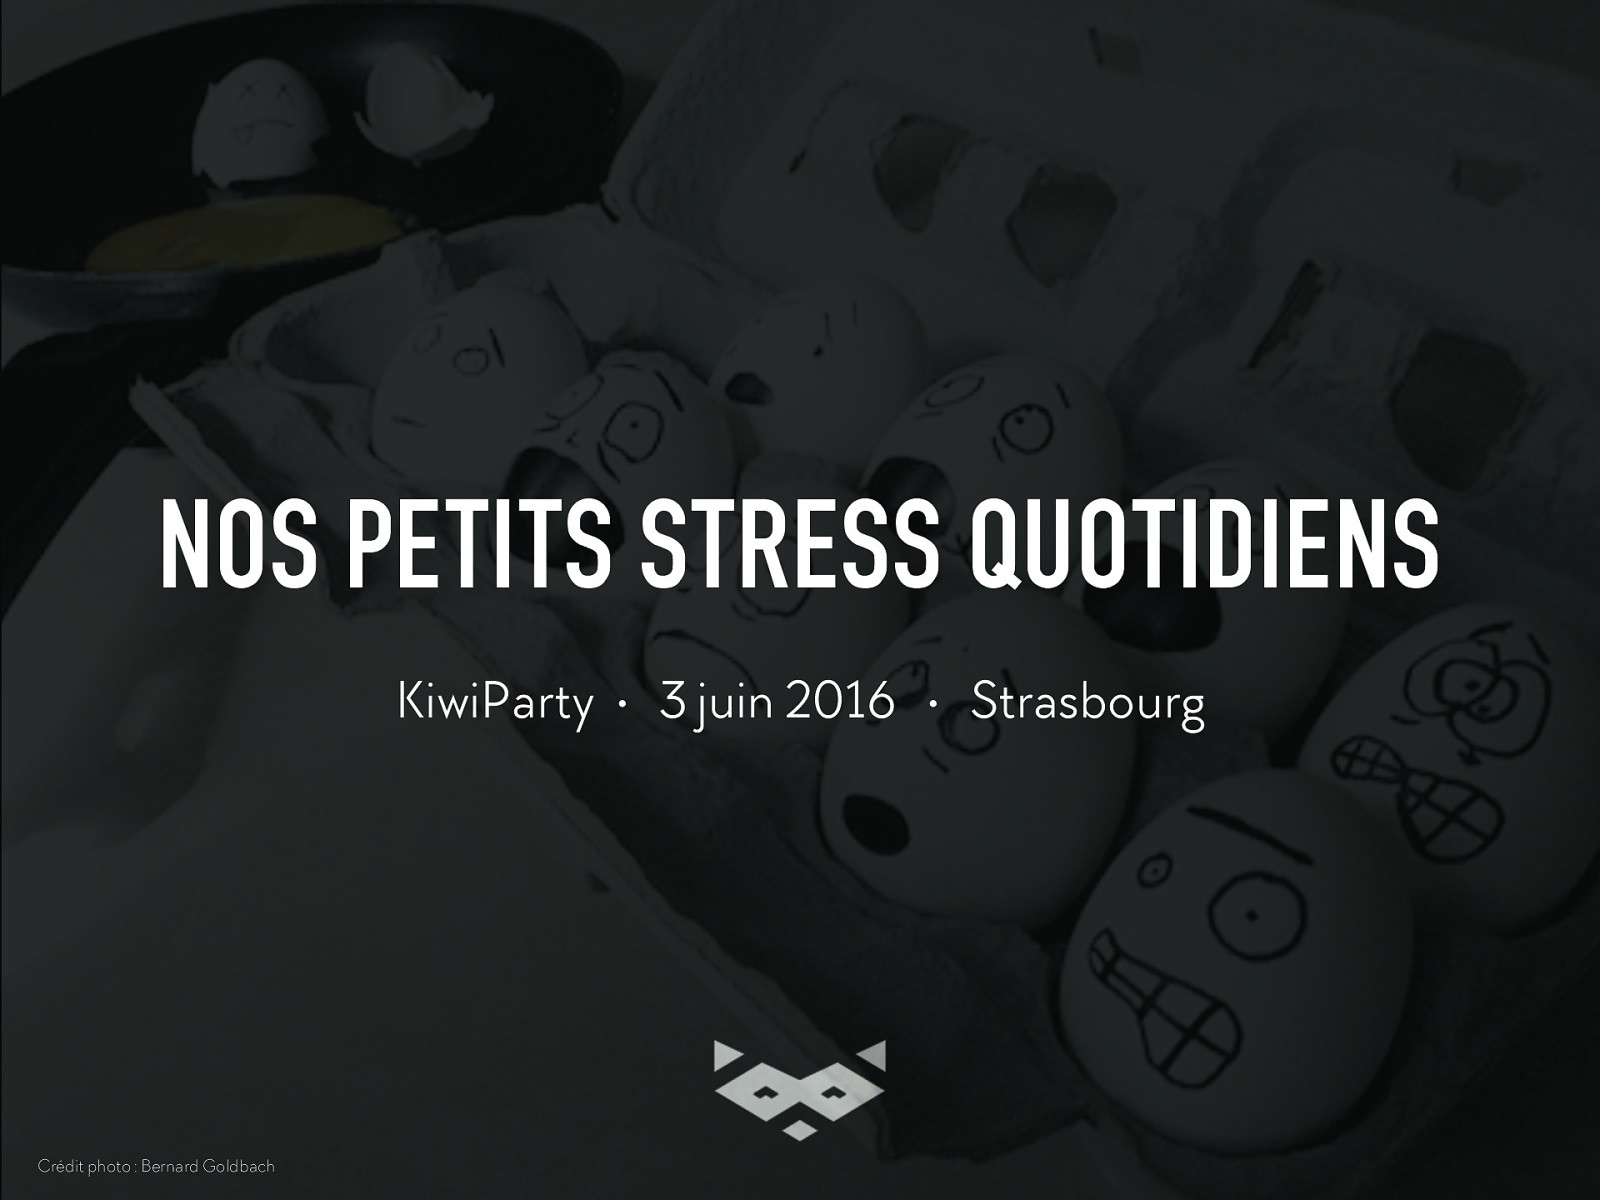 Nos petits stress quotidiens